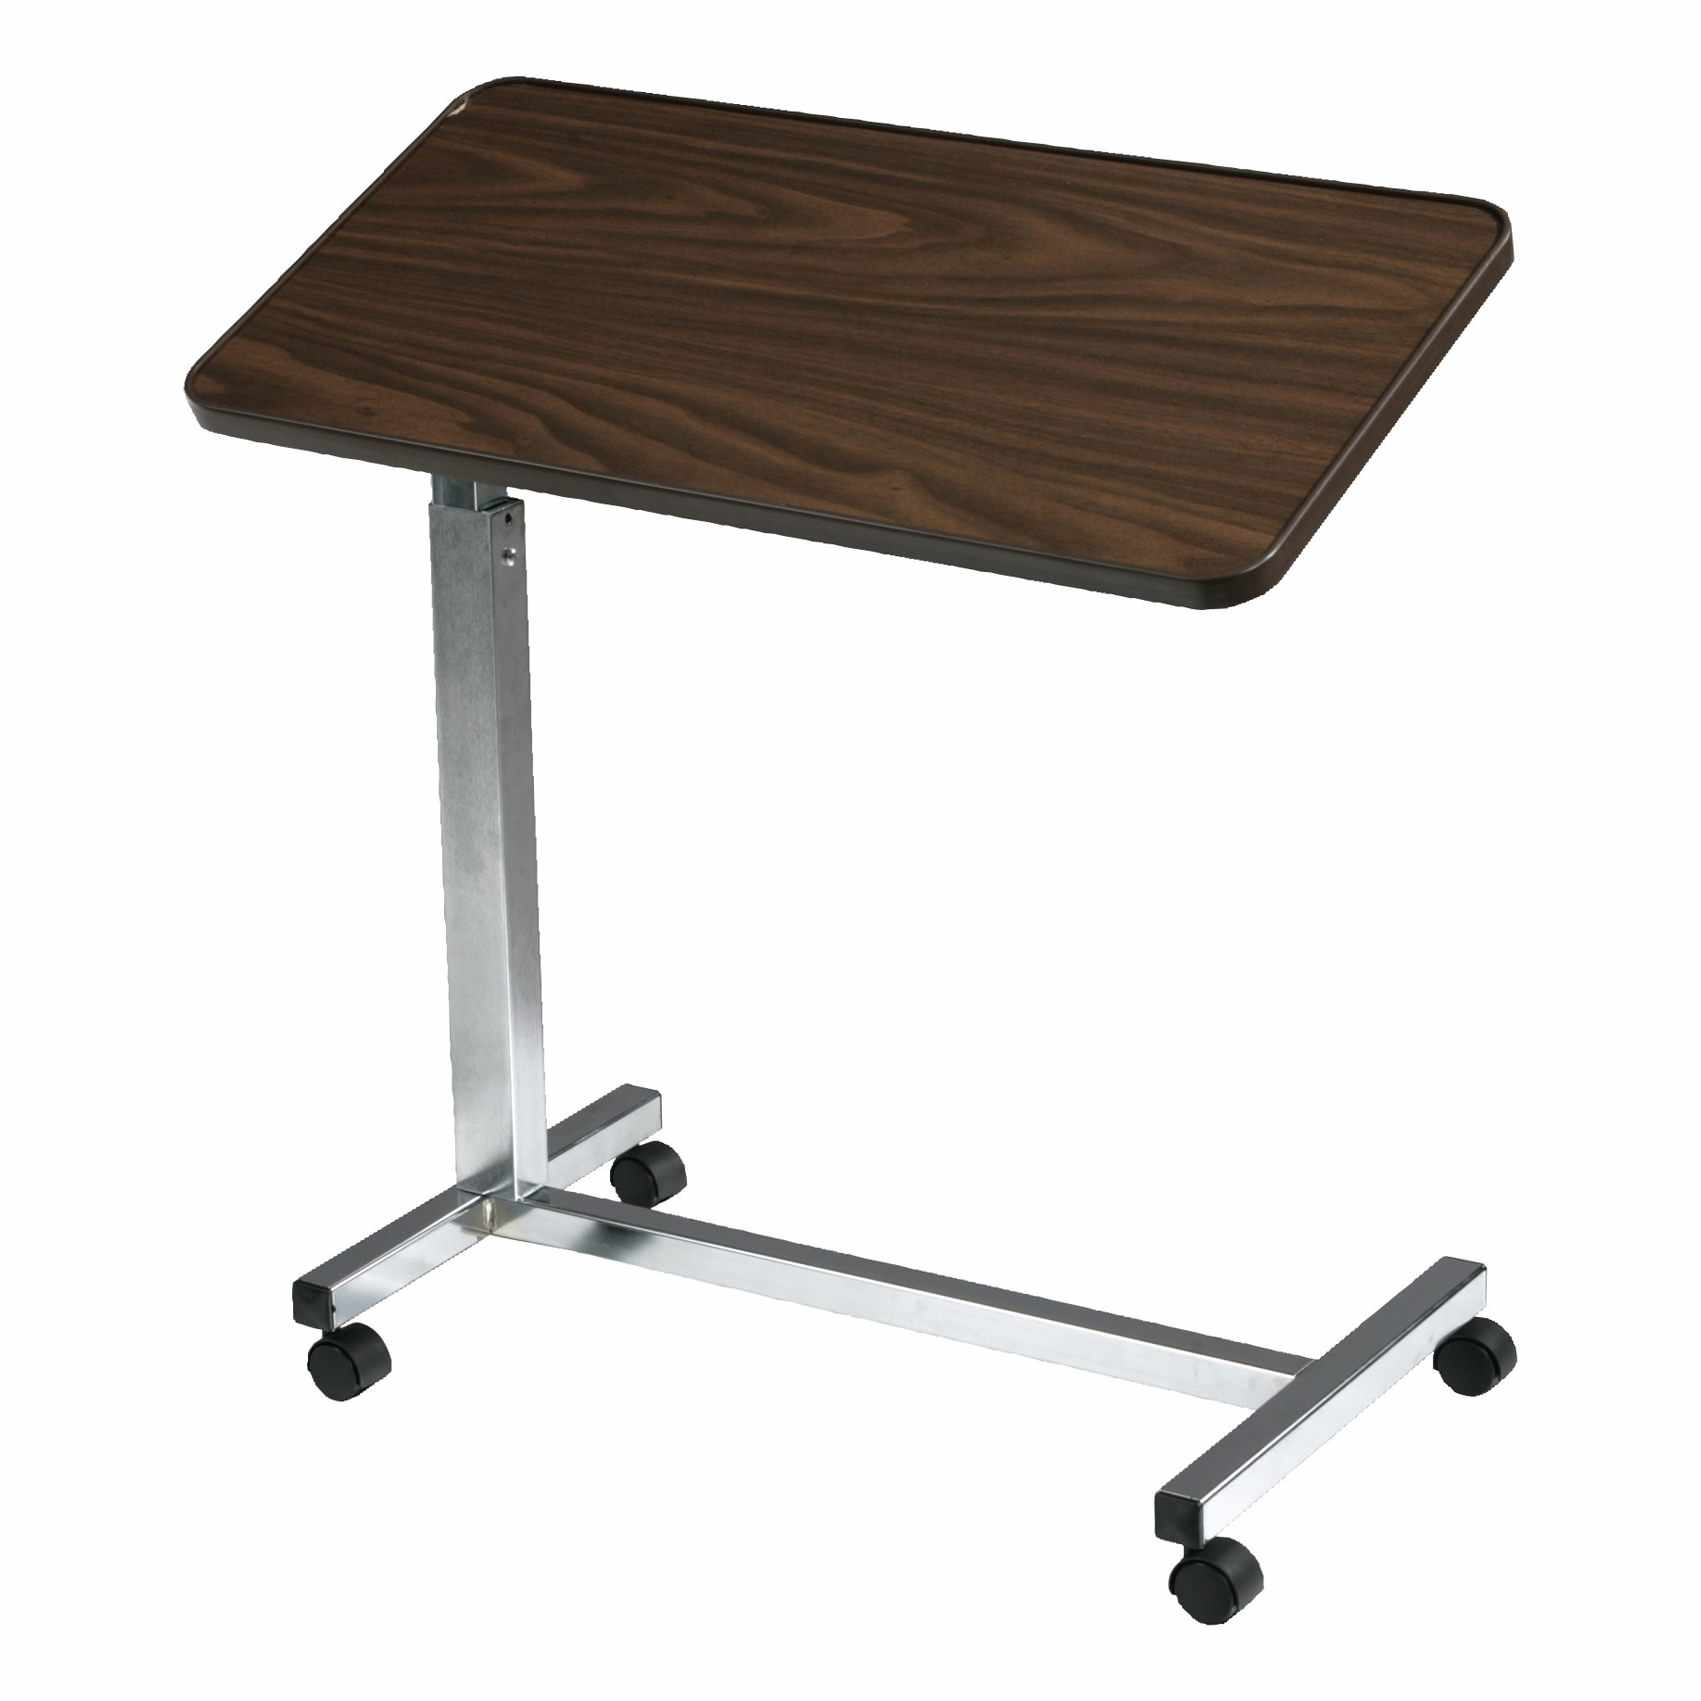 Drive deluxe tilt-top overbed table